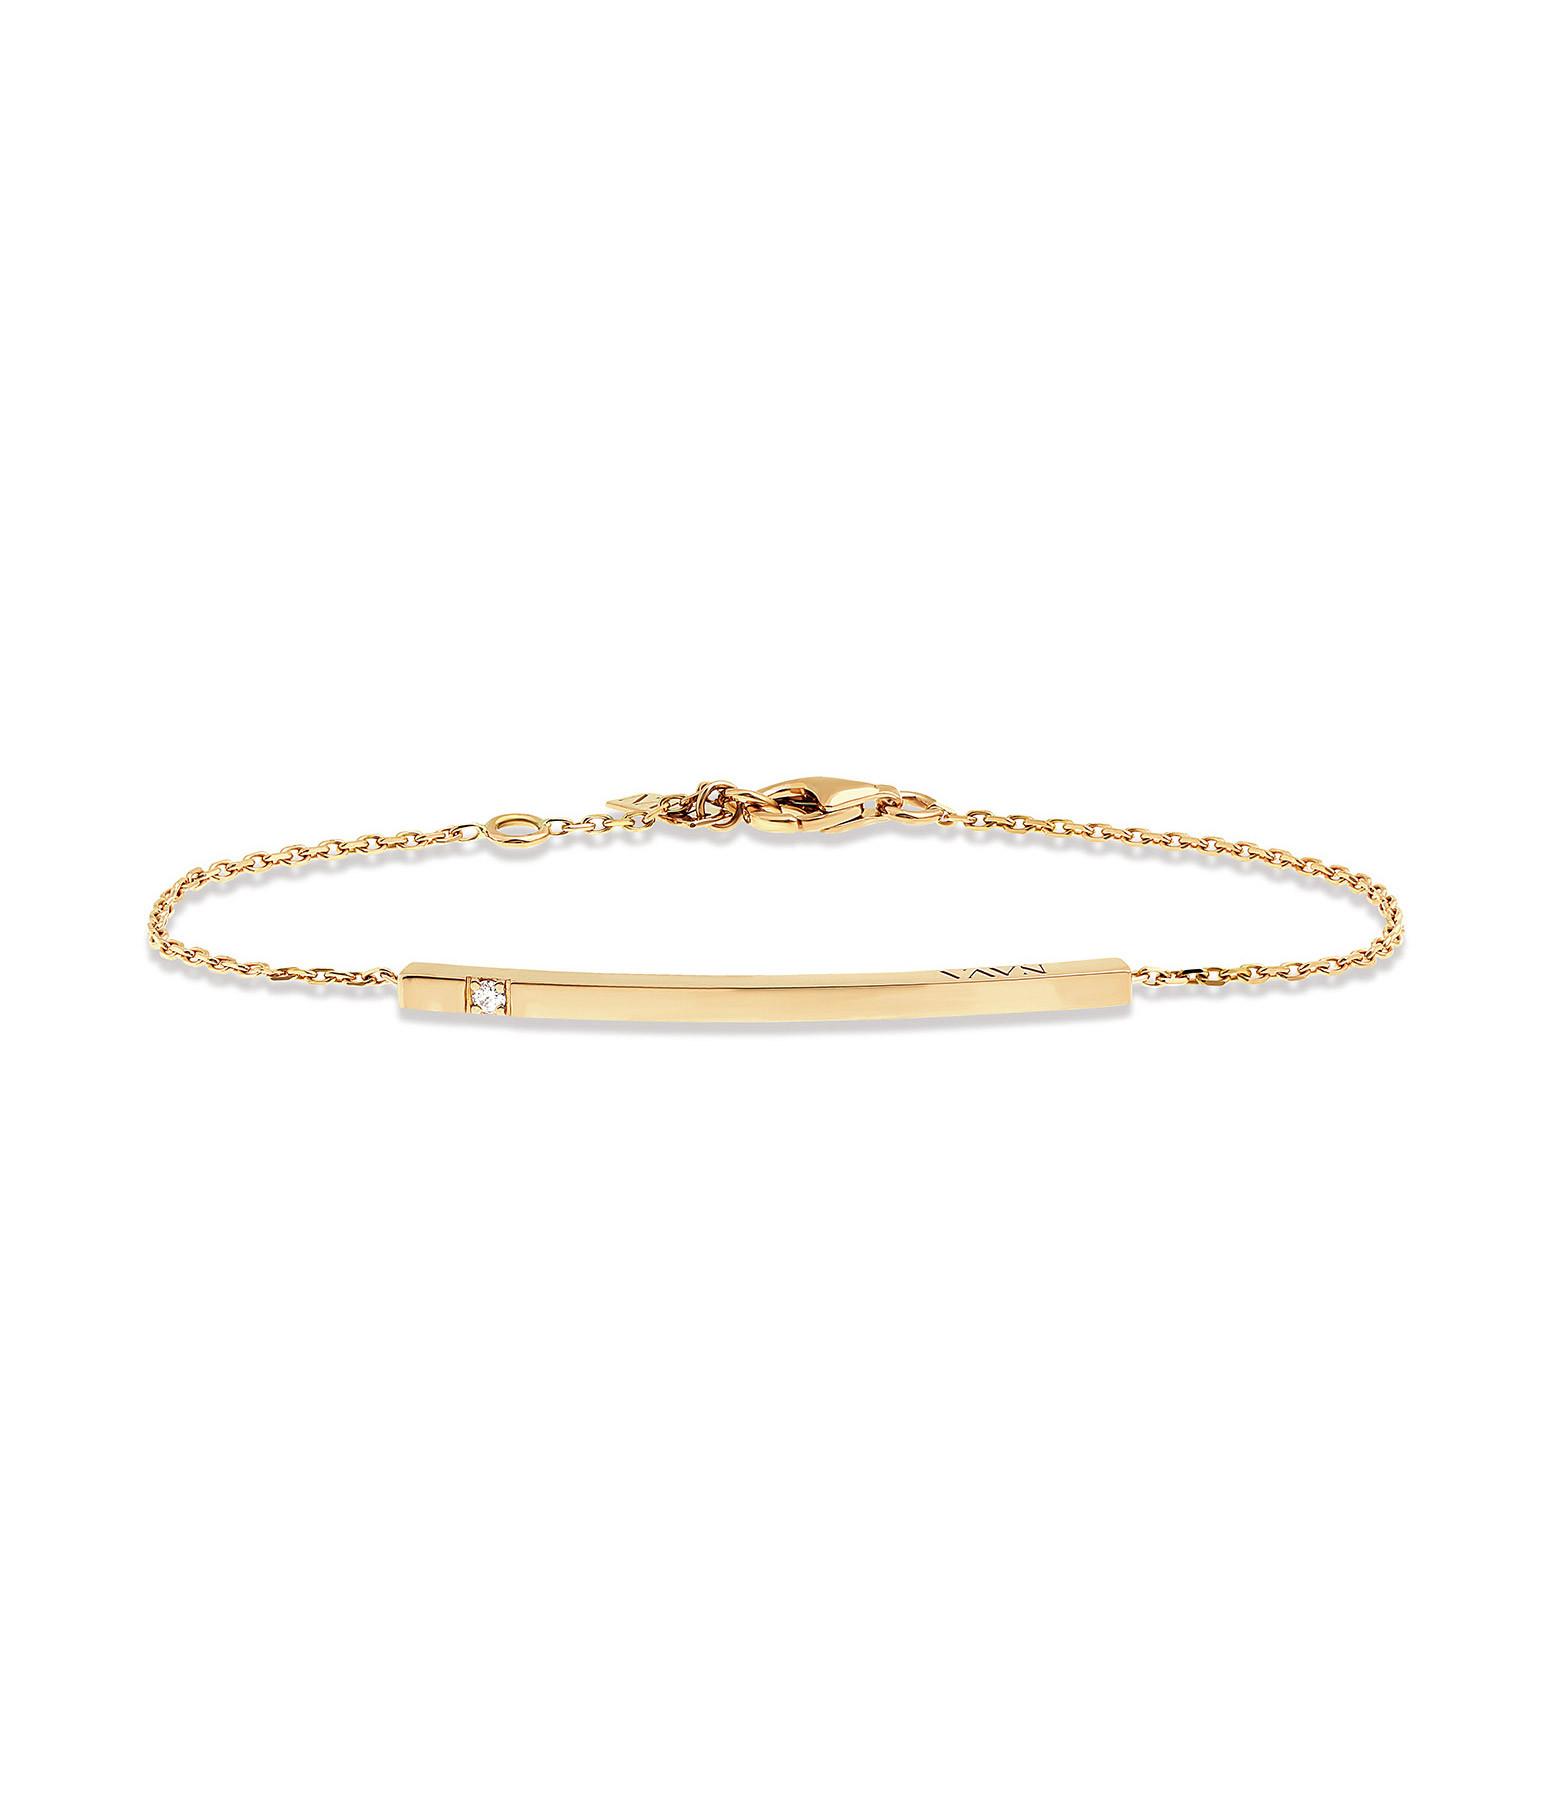 NAVA JOAILLERIE - Bracelet Hash One Or Jaune